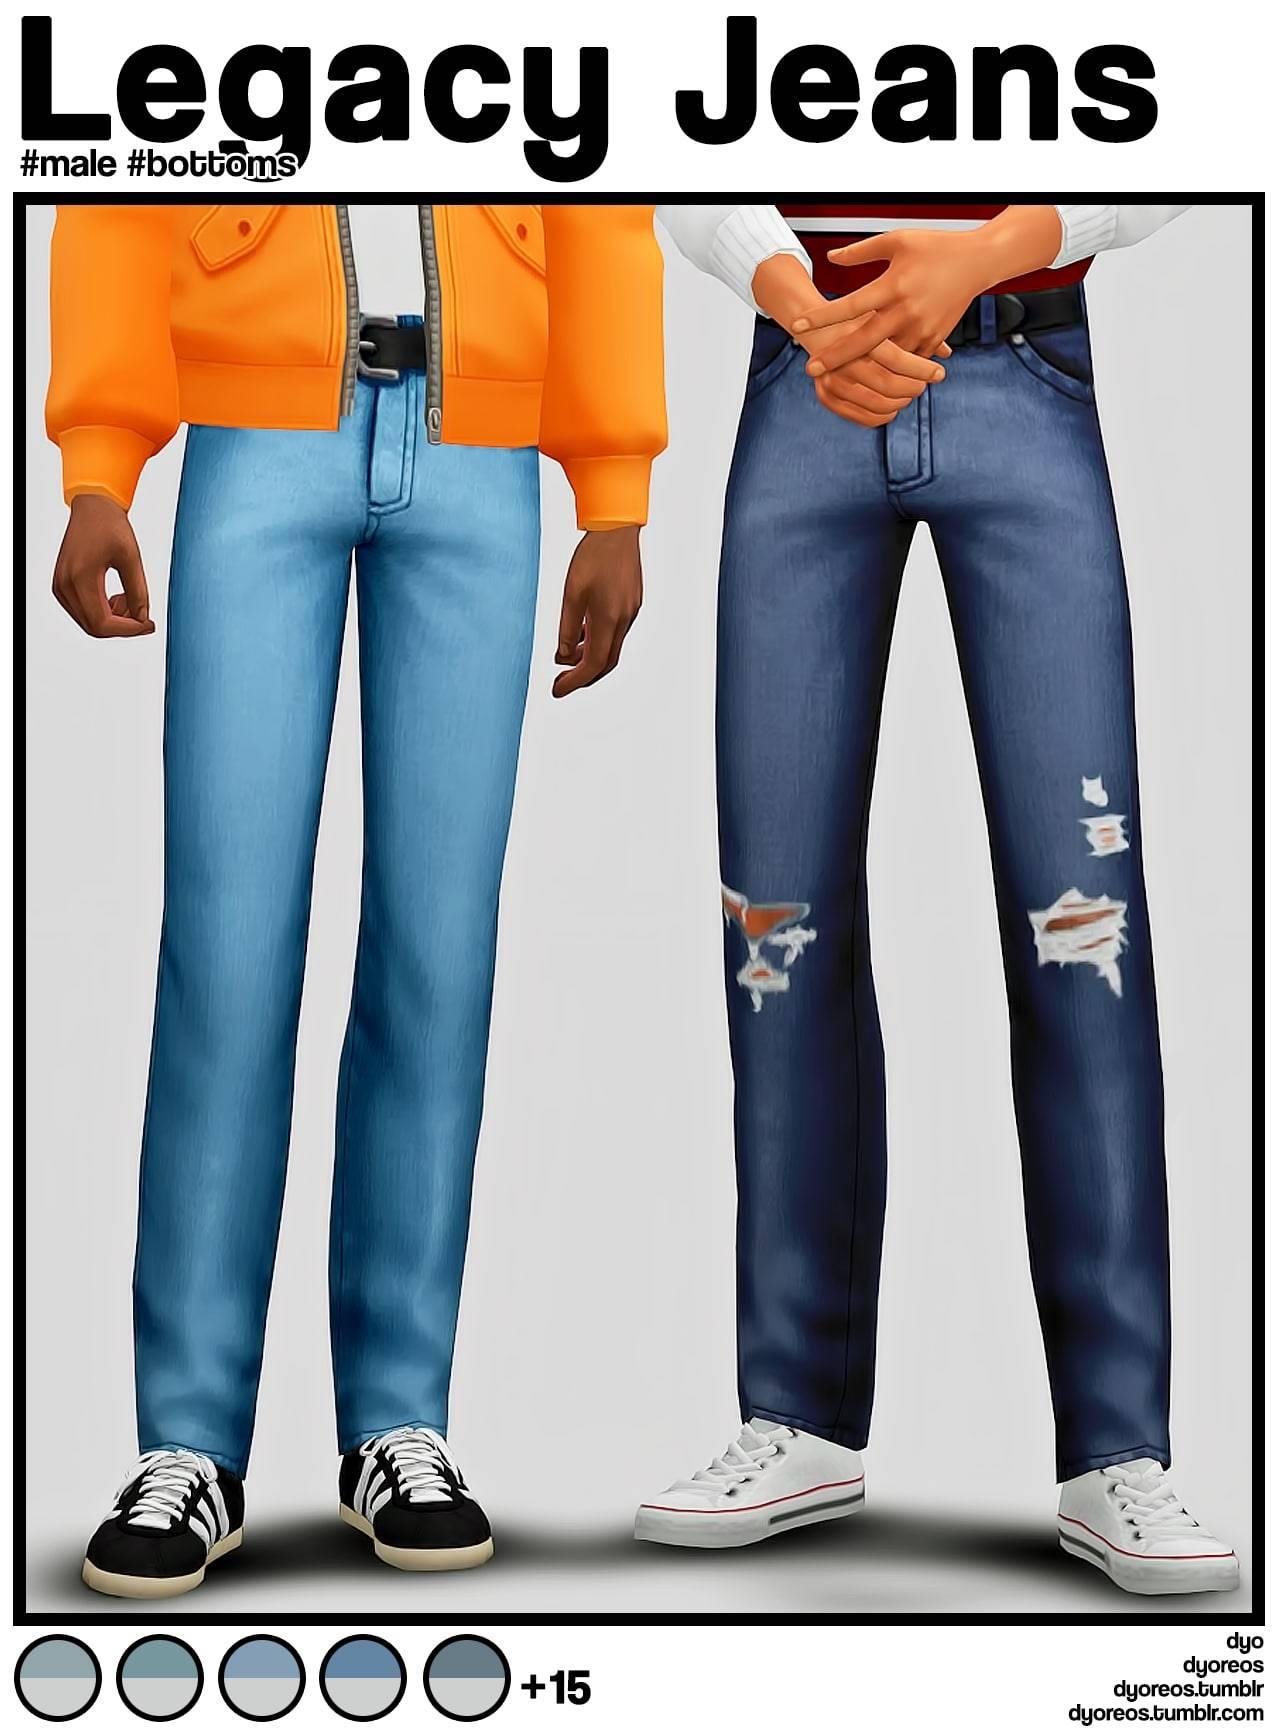 Мужские джинсы - Legacy Jeans